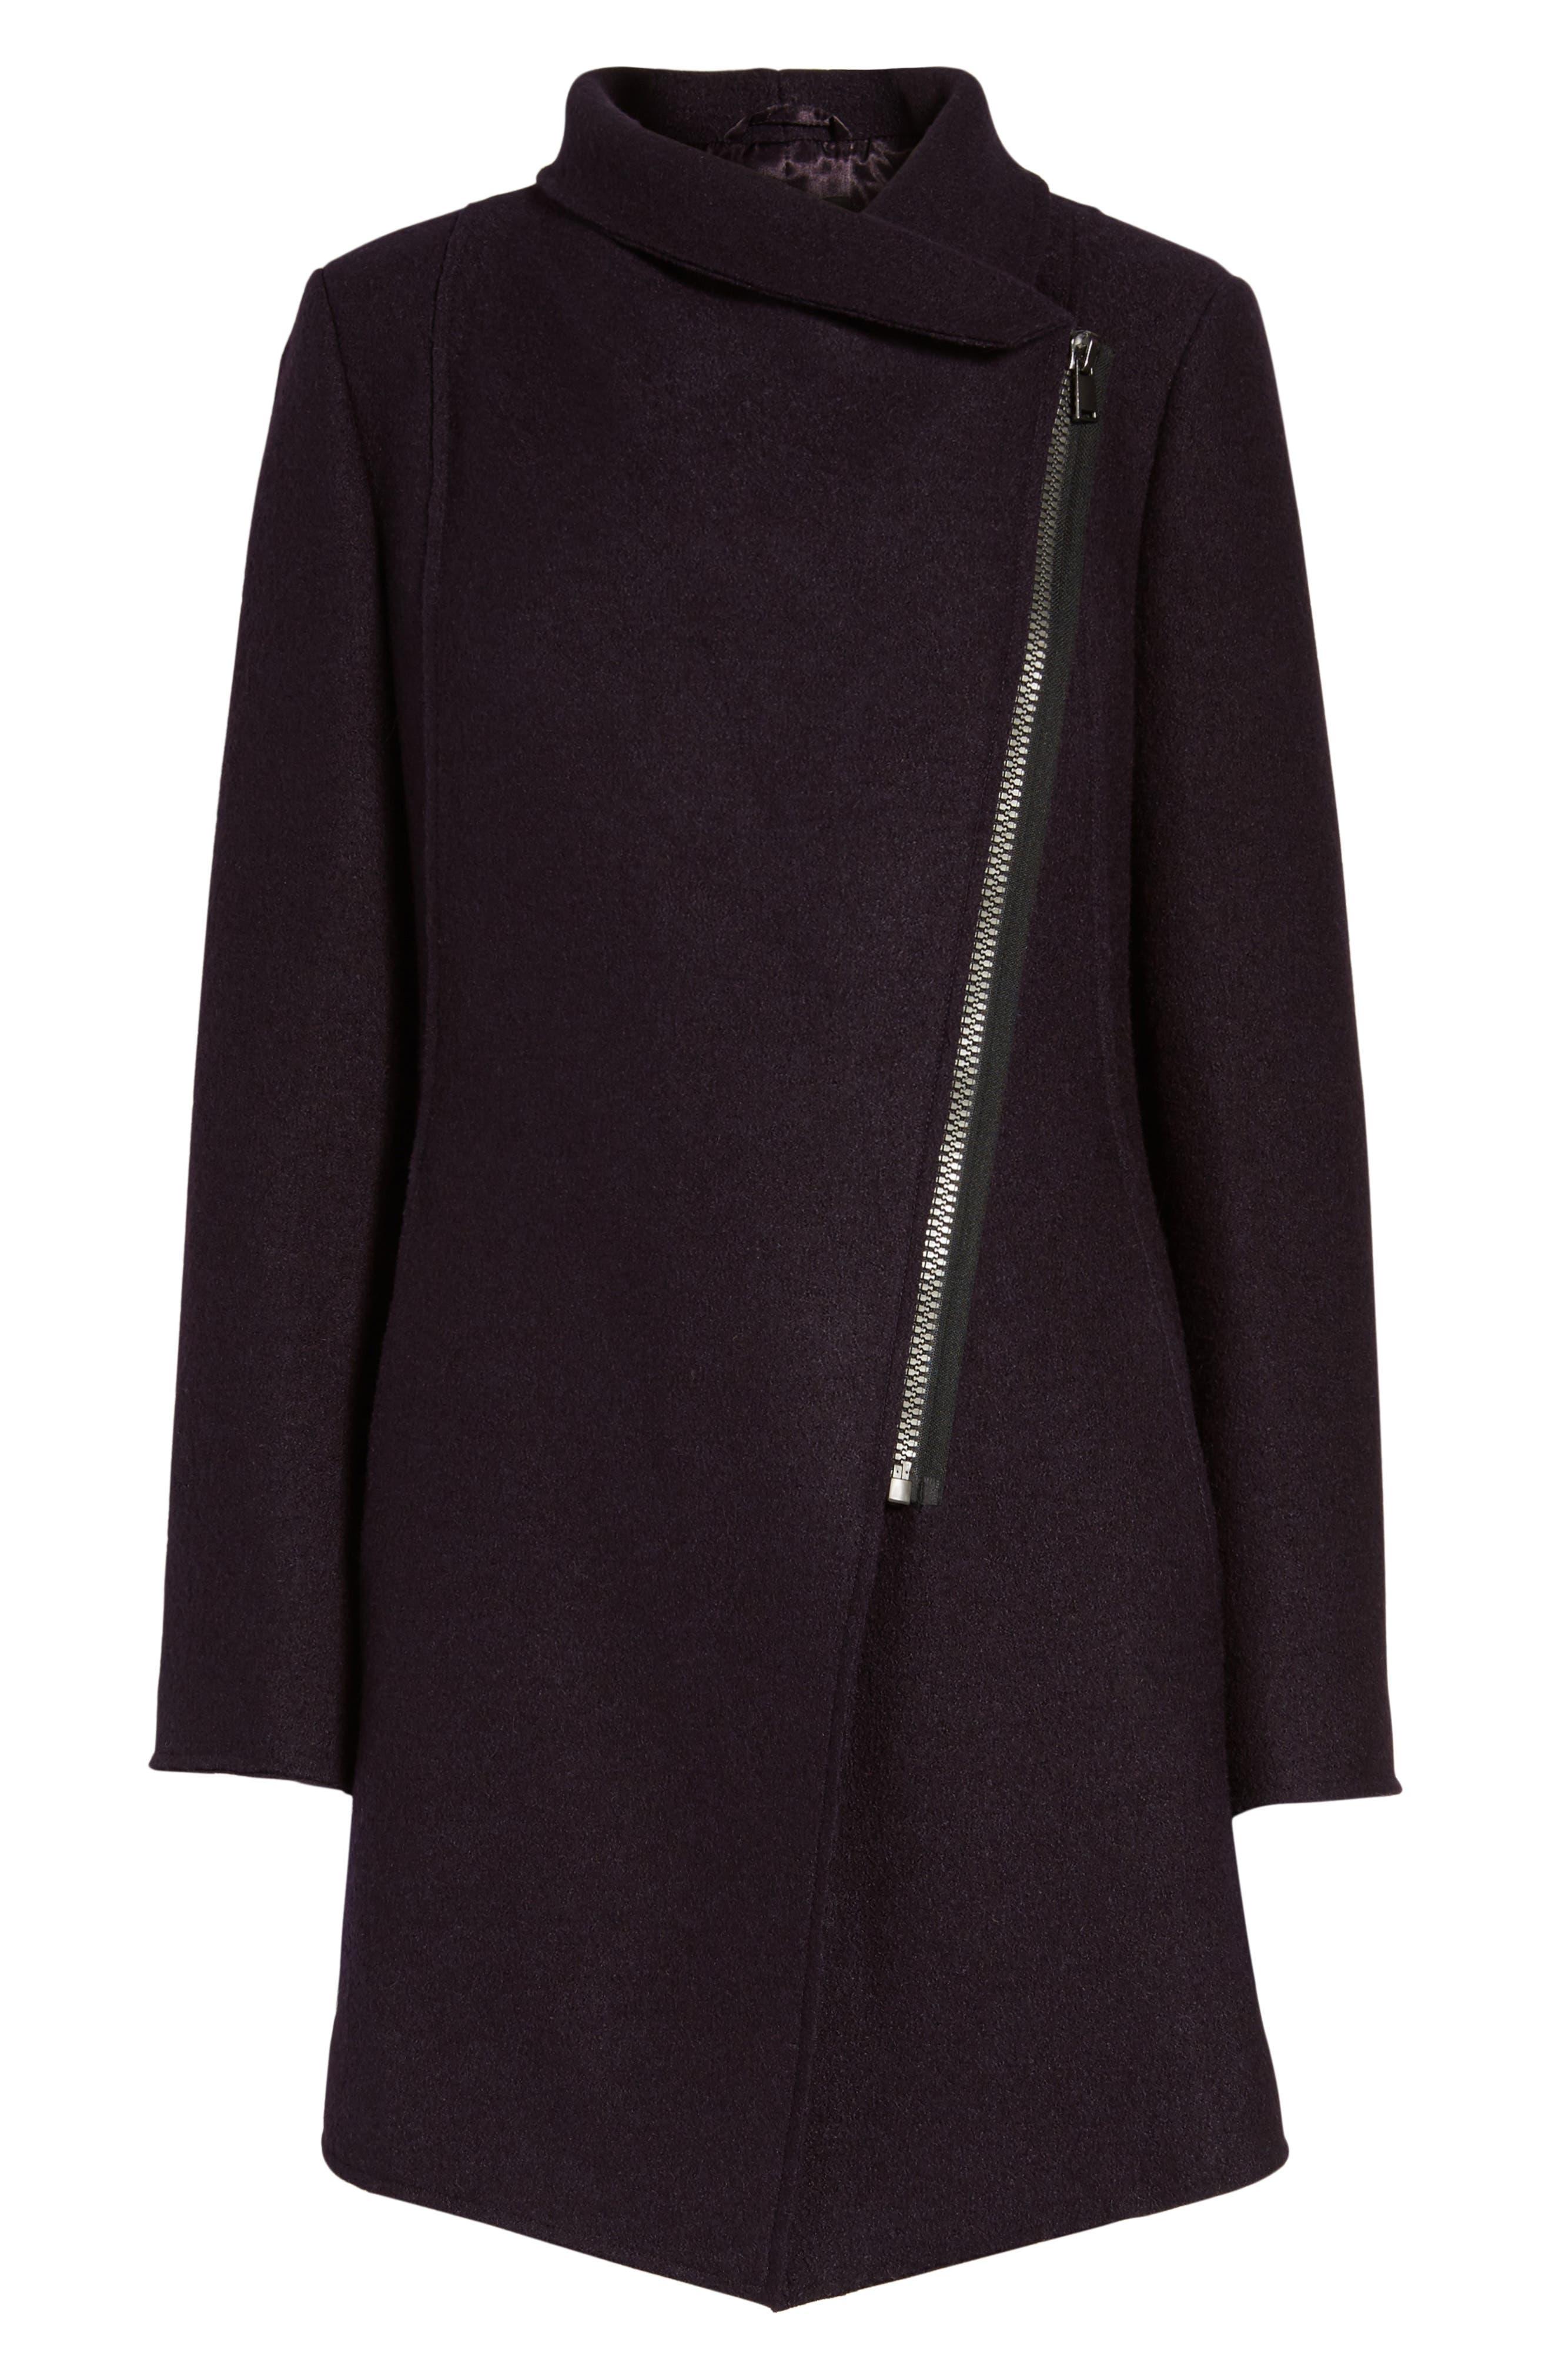 HALOGEN<SUP>®</SUP>, Asymmetrical Zip Boiled Wool Blend Coat, Alternate thumbnail 6, color, 500